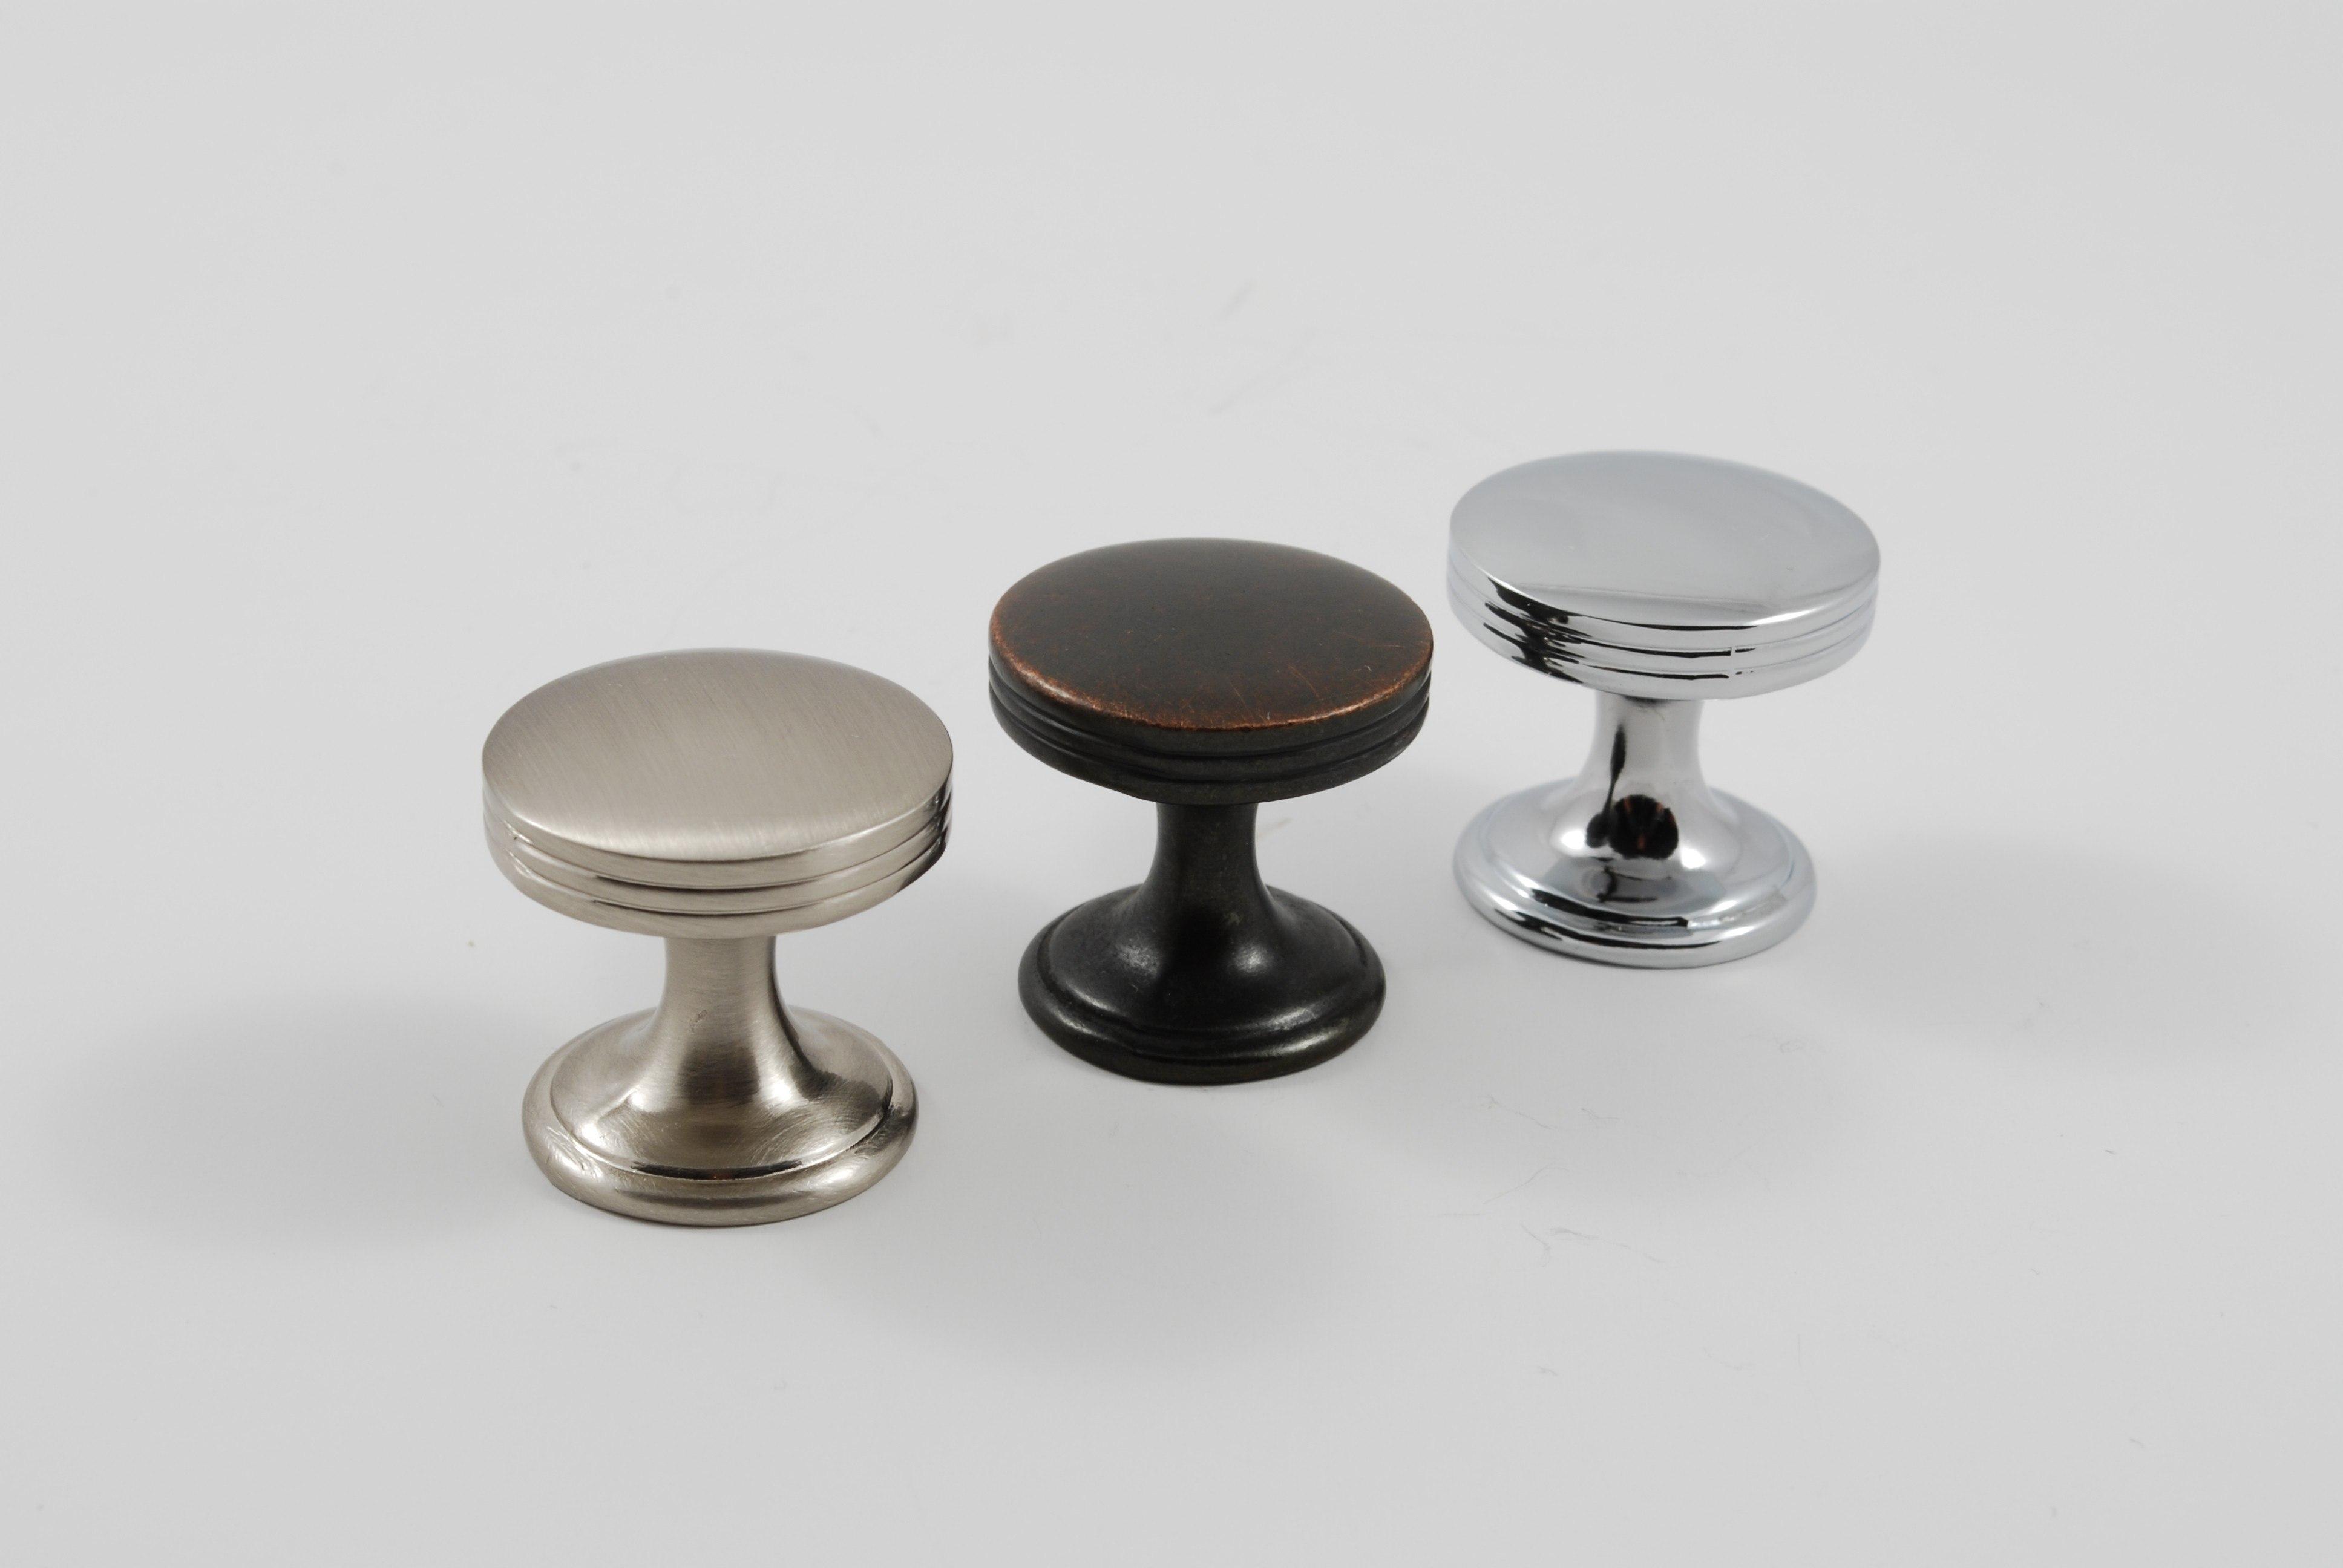 Residential Essentials 10297 Cabinet Knob